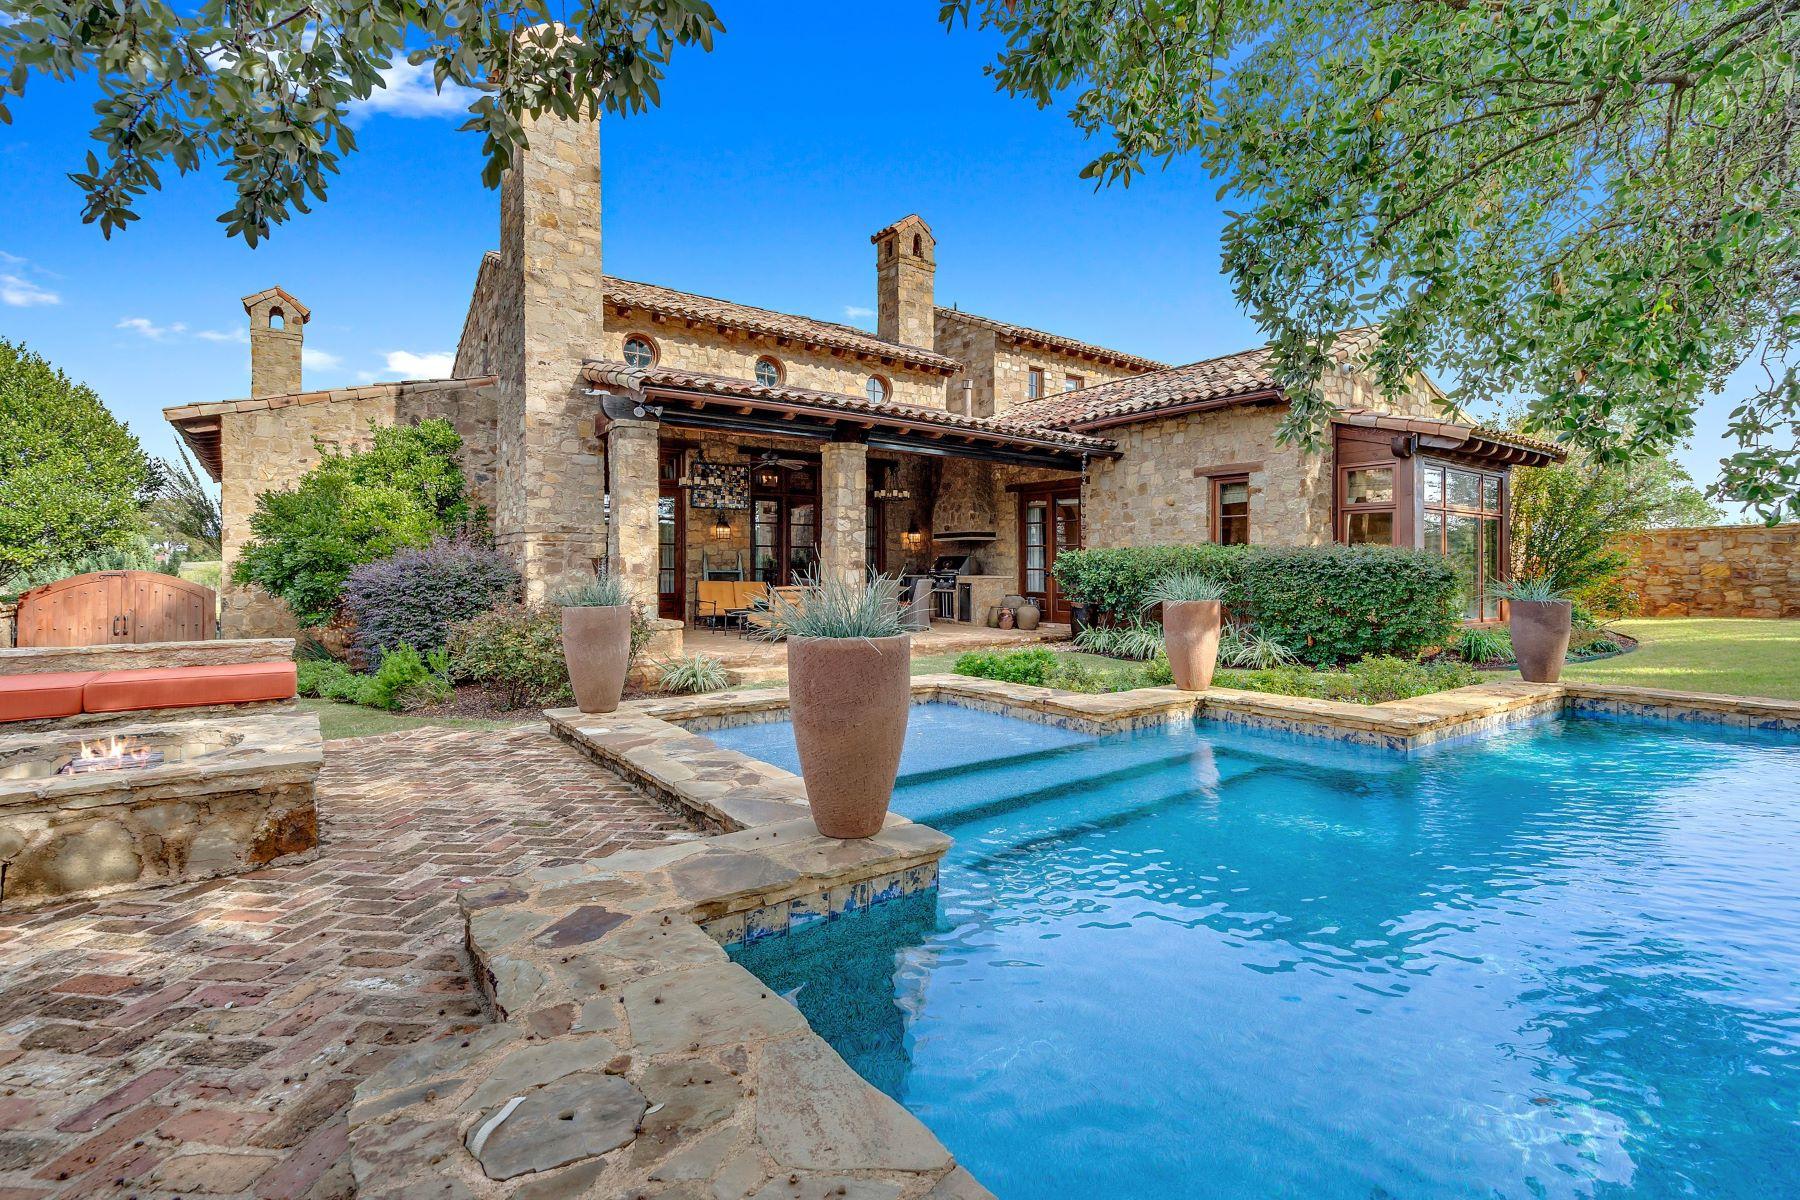 Single Family Homes for Sale at 104 Estrella // Escondido Golf & Lake Club // Horseshoe Bay, TX 104 Estrella // Escondido Golf and Lake Club Horseshoe Bay, Texas 78657 United States